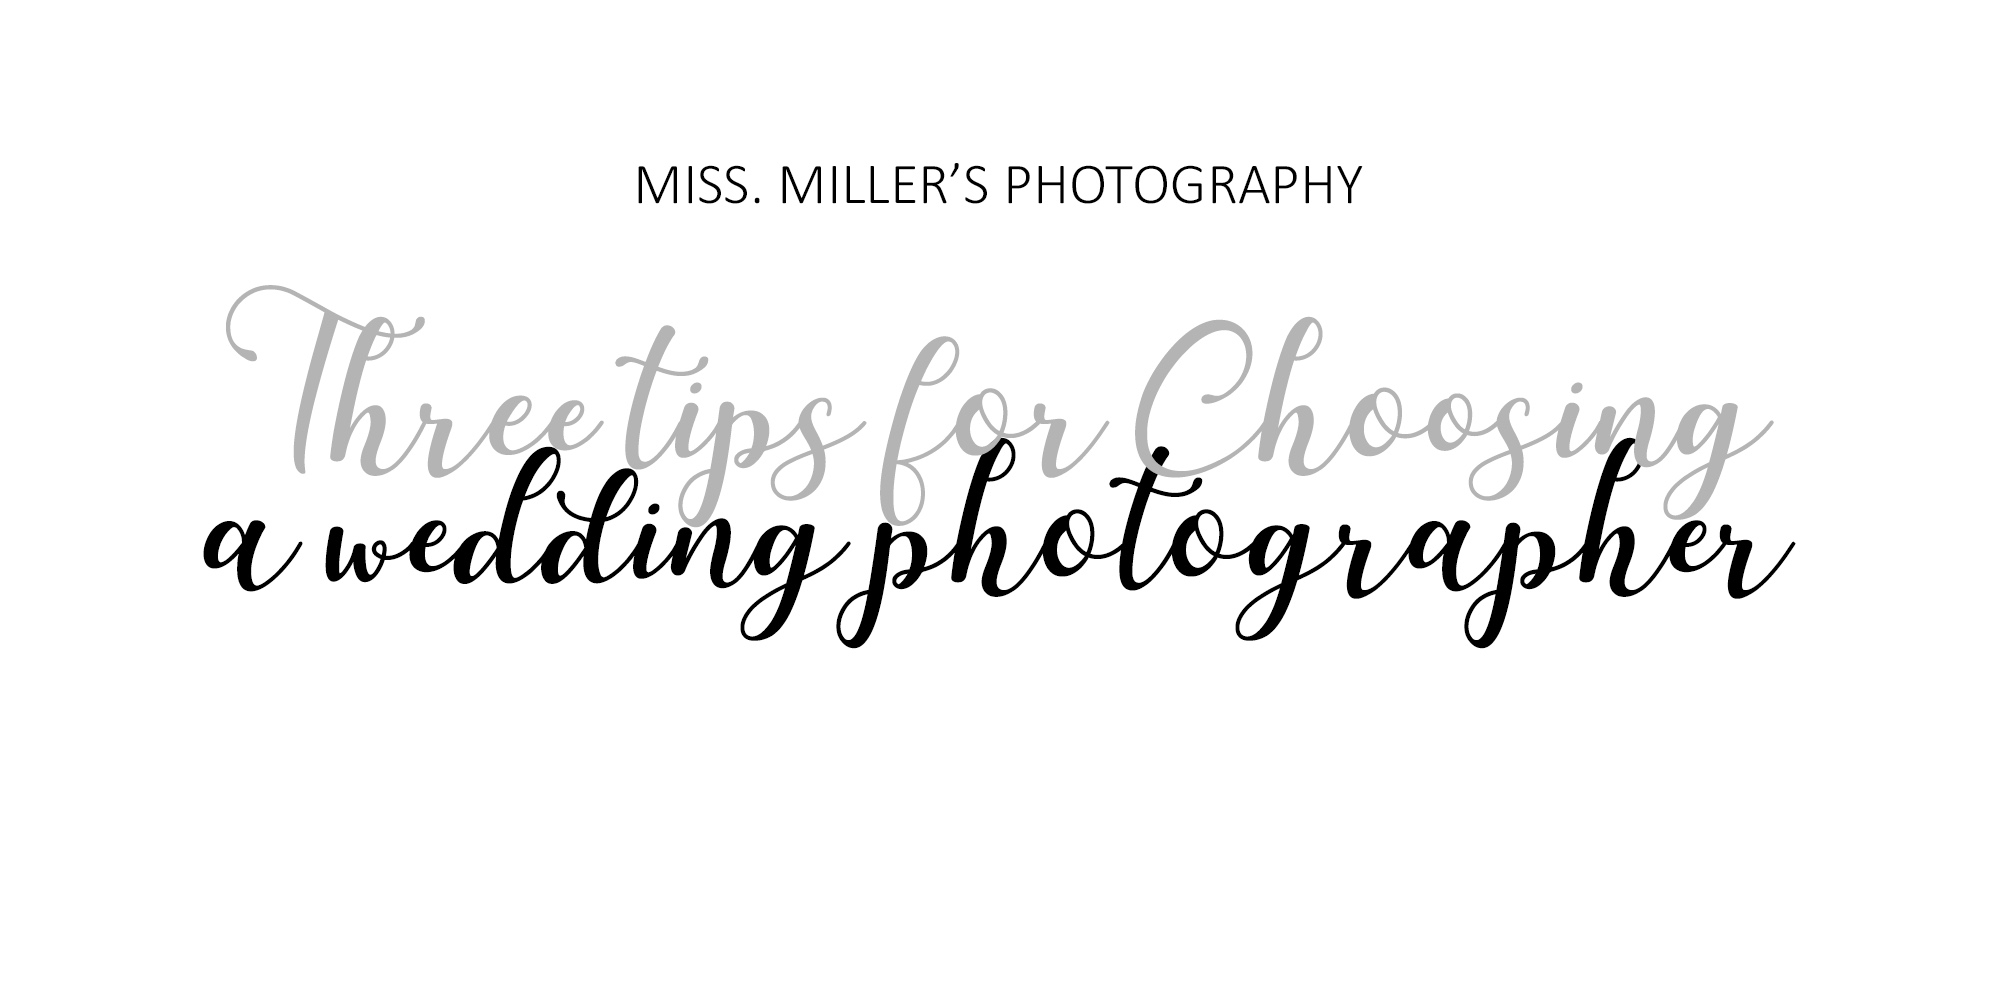 wedding photographer freebie image 1.jpg